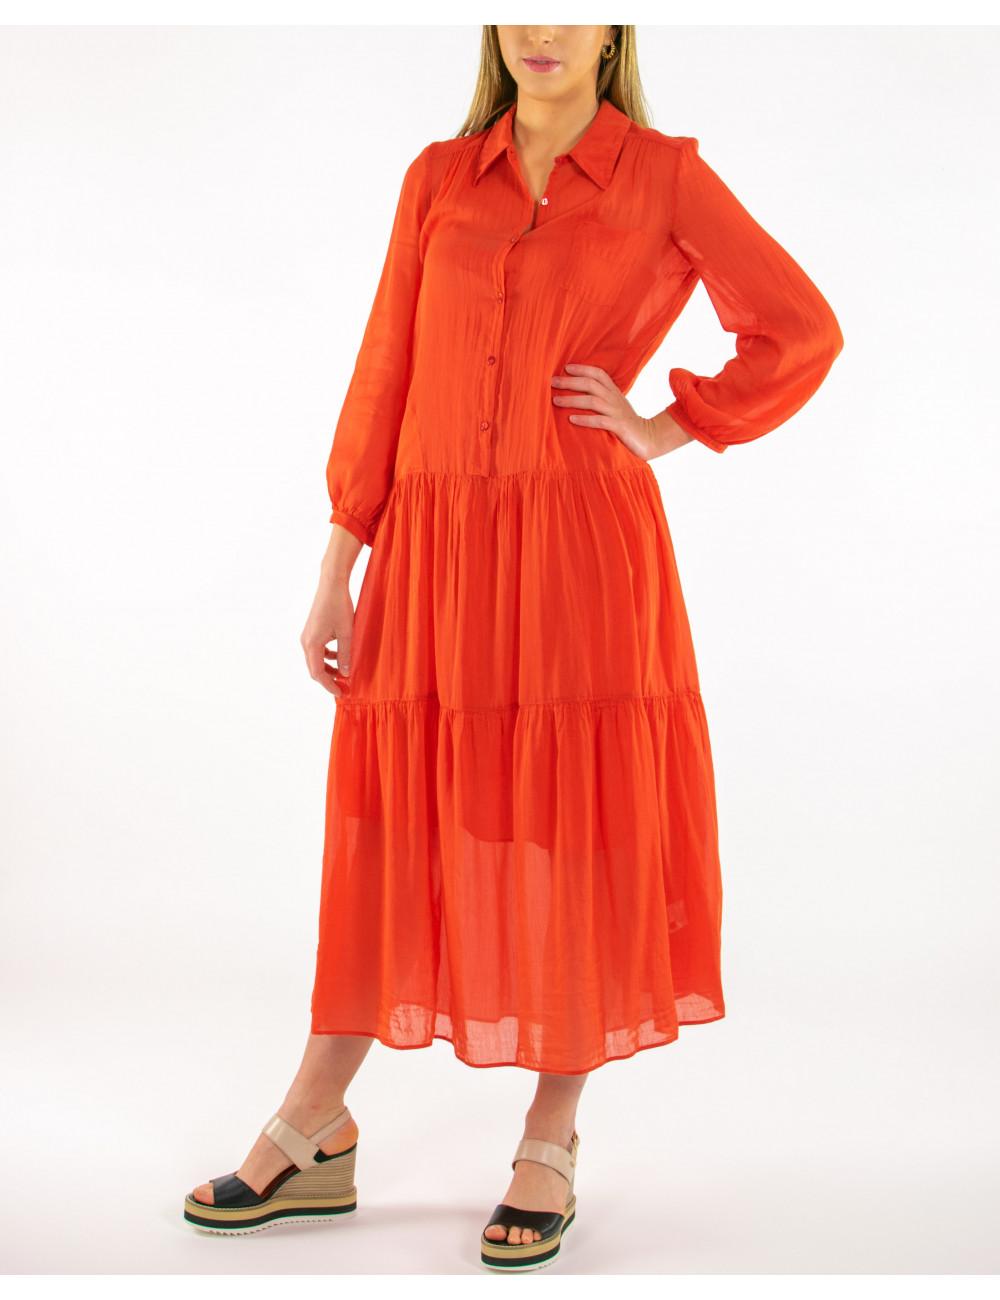 vestido-camisero-1961-milano.jpg